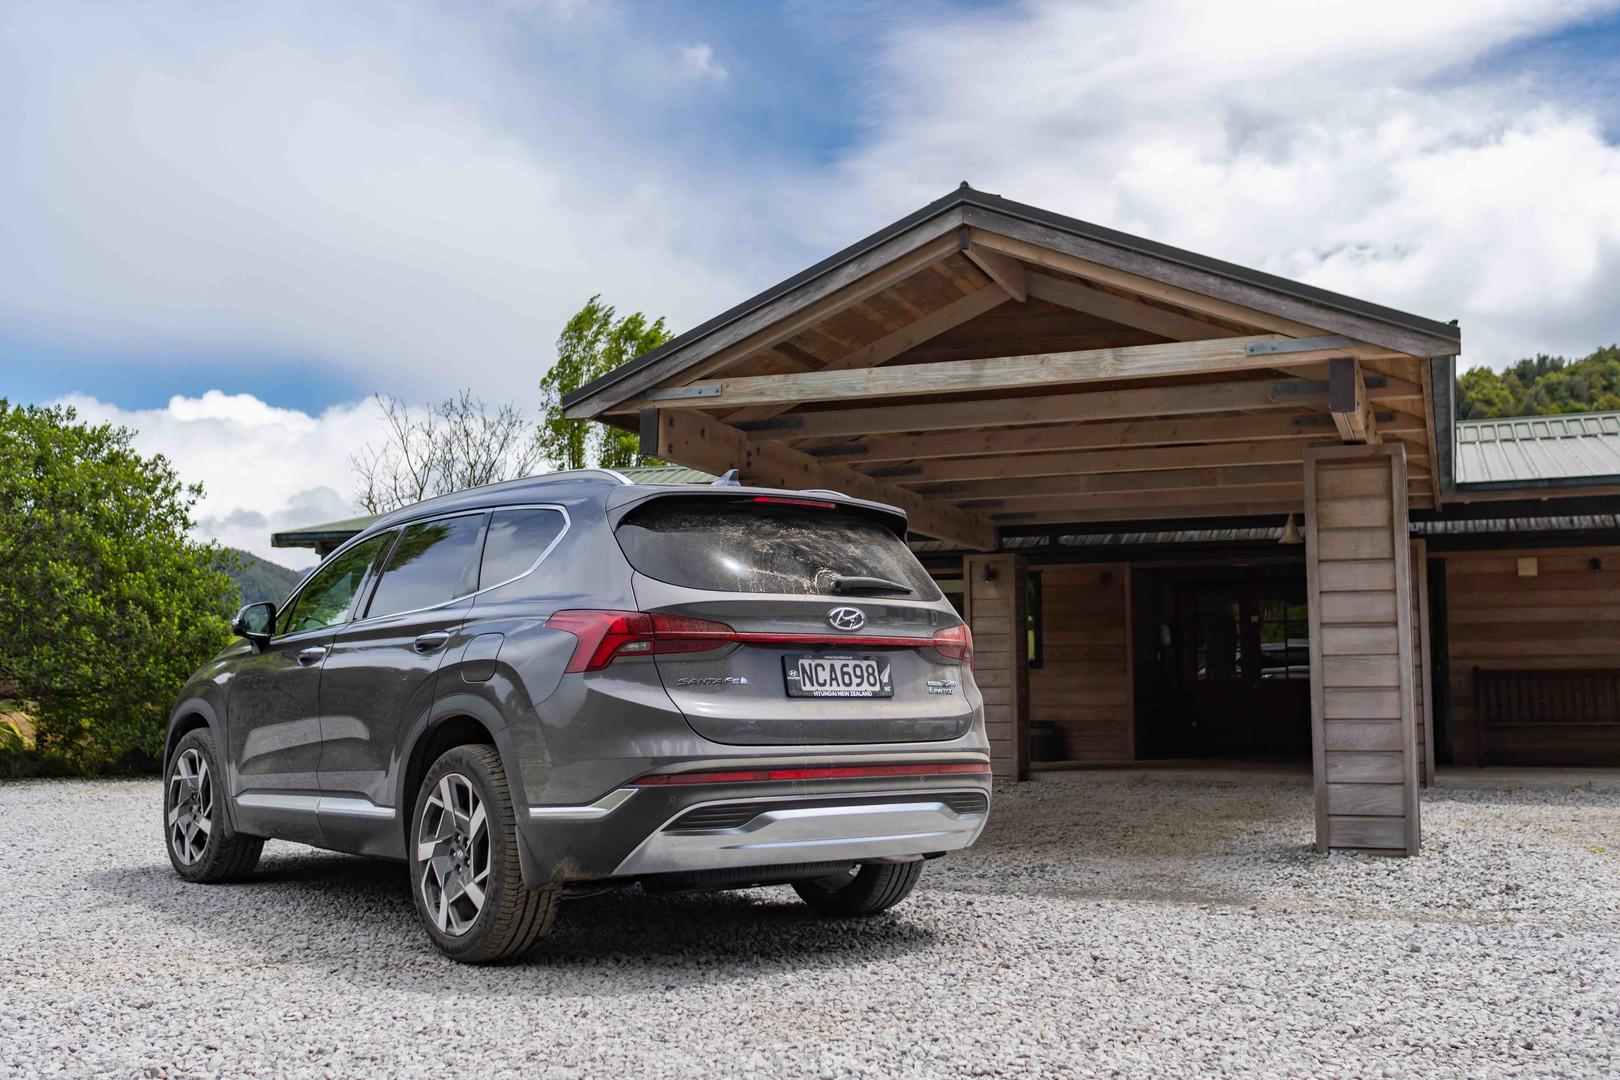 Hyundai Santa Fe at Poronui Lodge, New Zealand